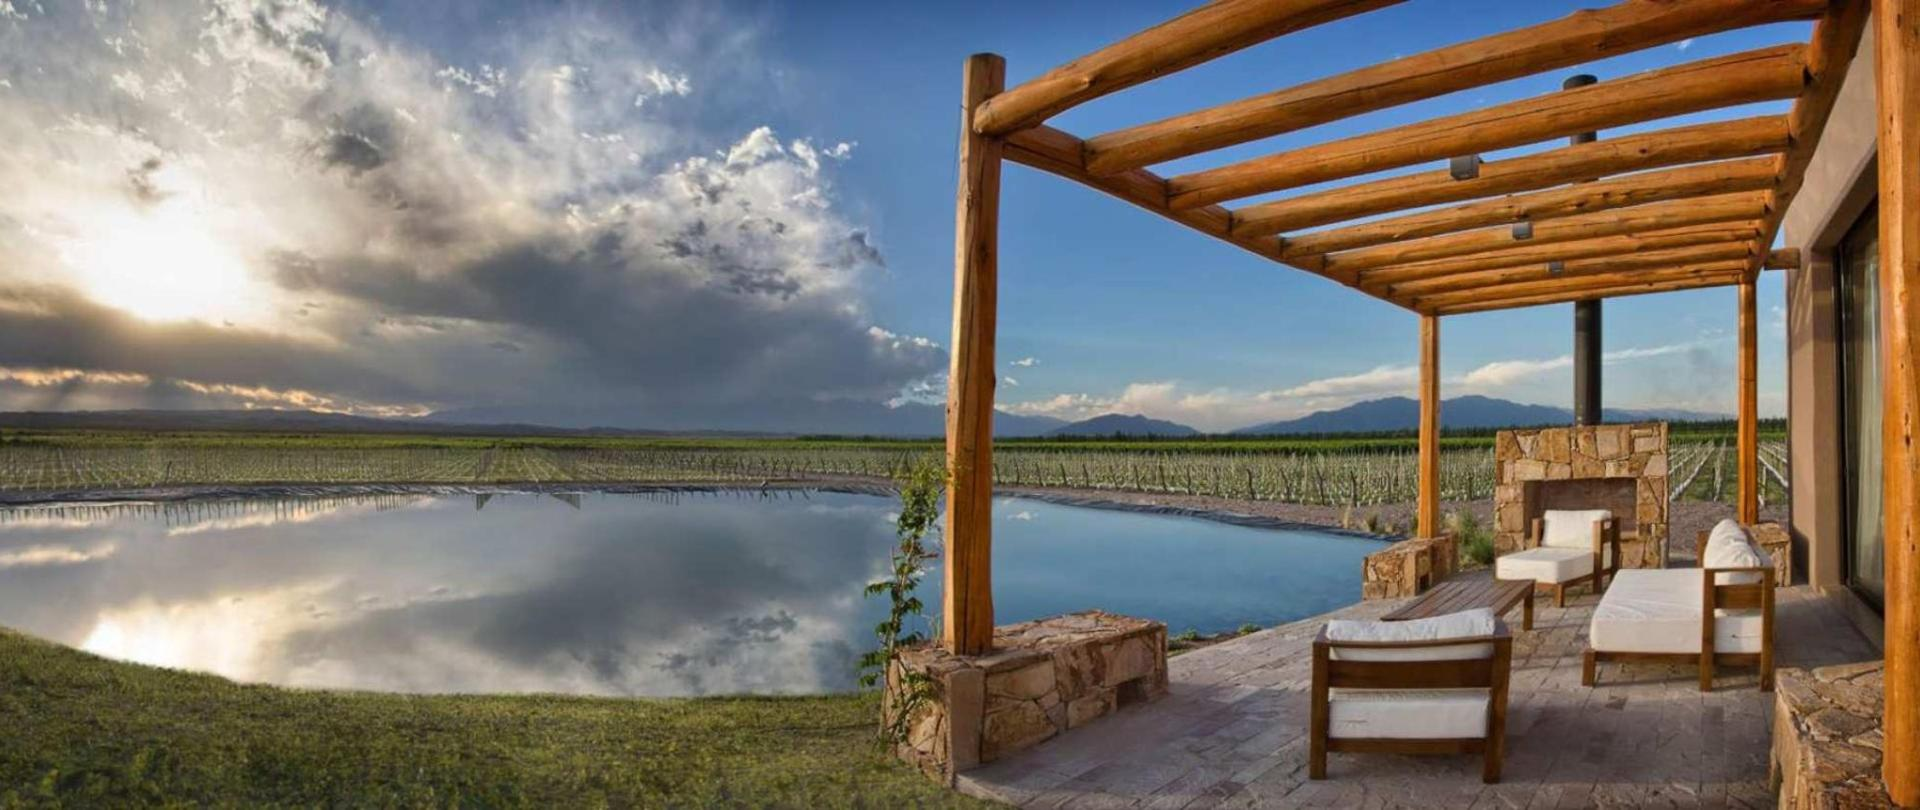 rosell-boher-lodge-argentina.jpg